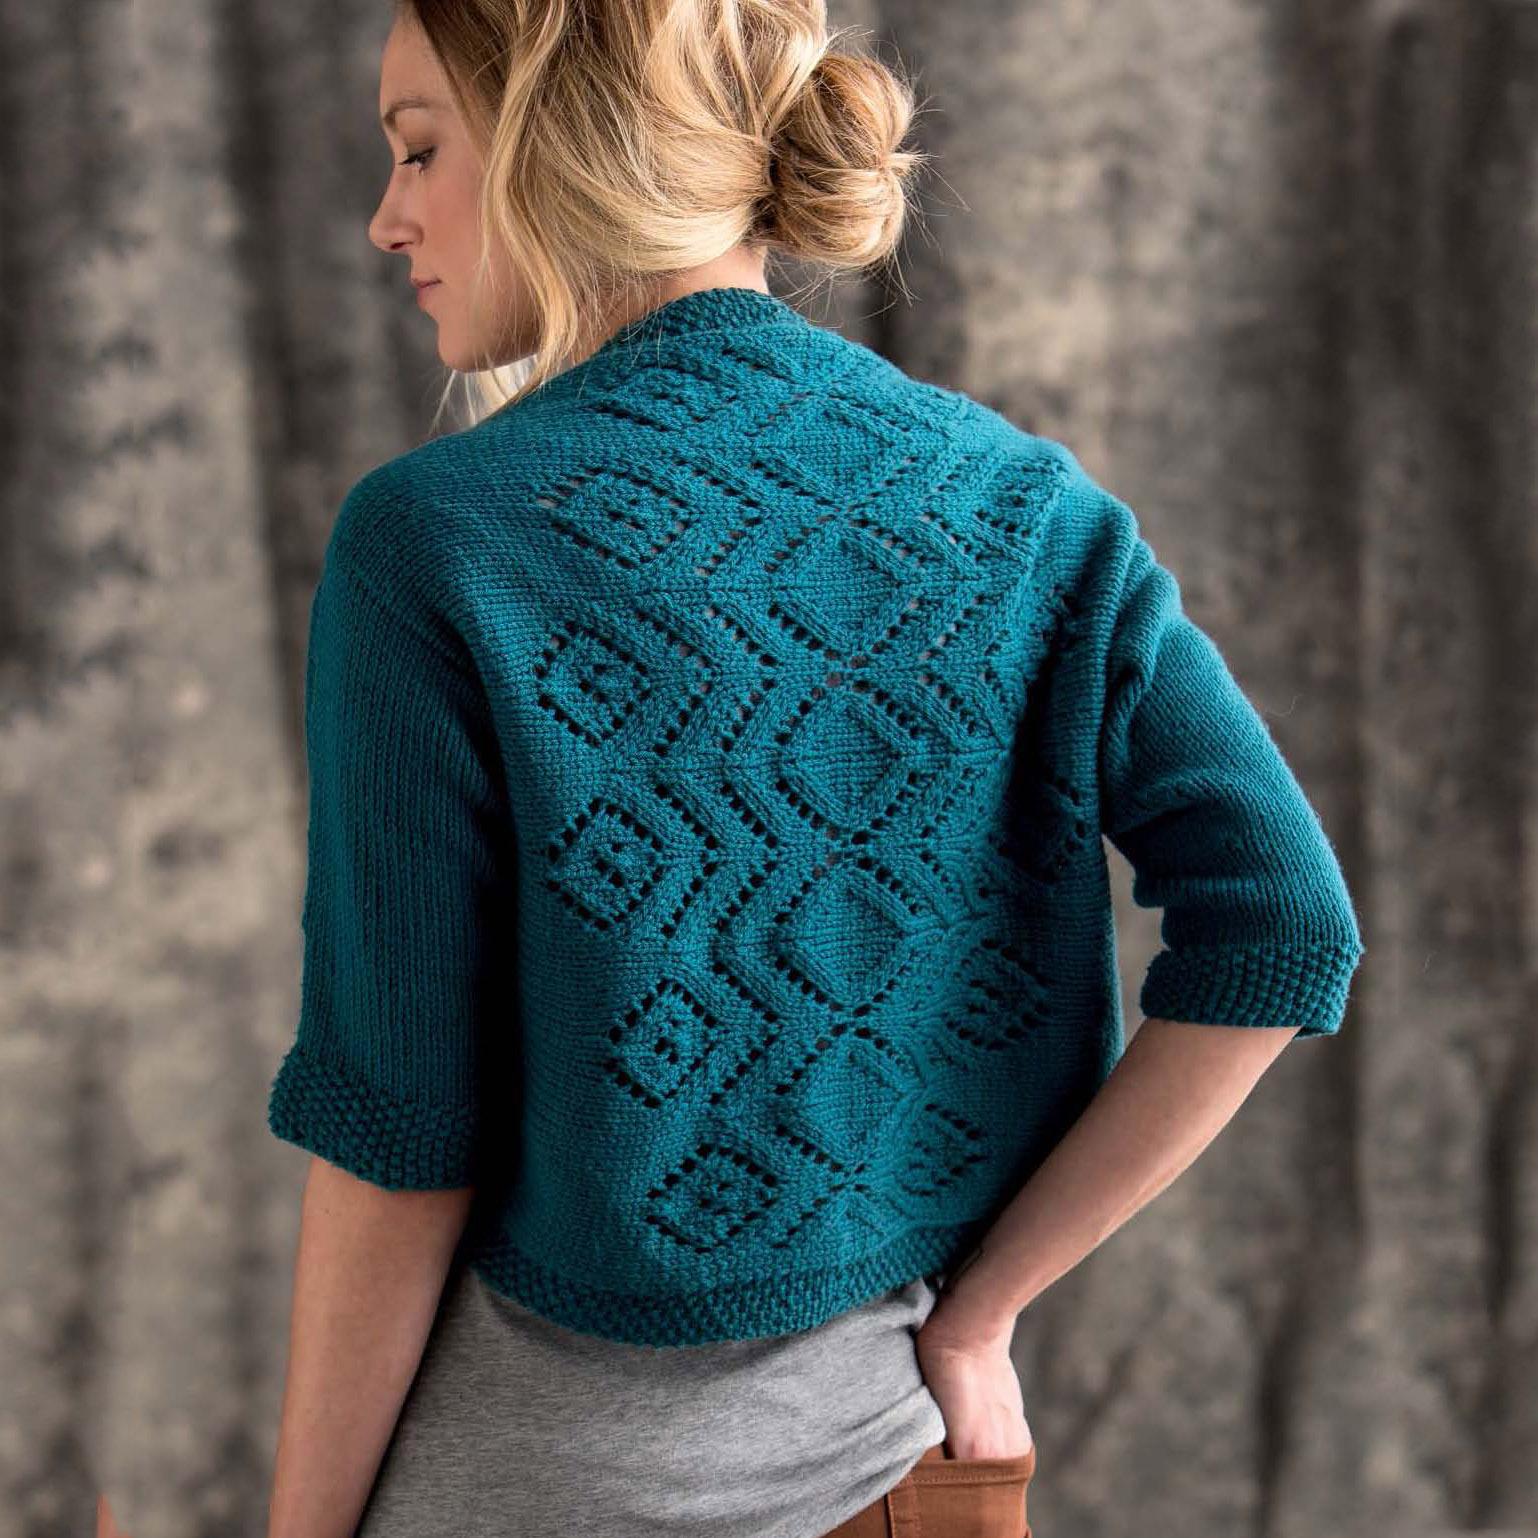 Knit Shrug Pattern : Germander Shrug Pattern - Knit Darling